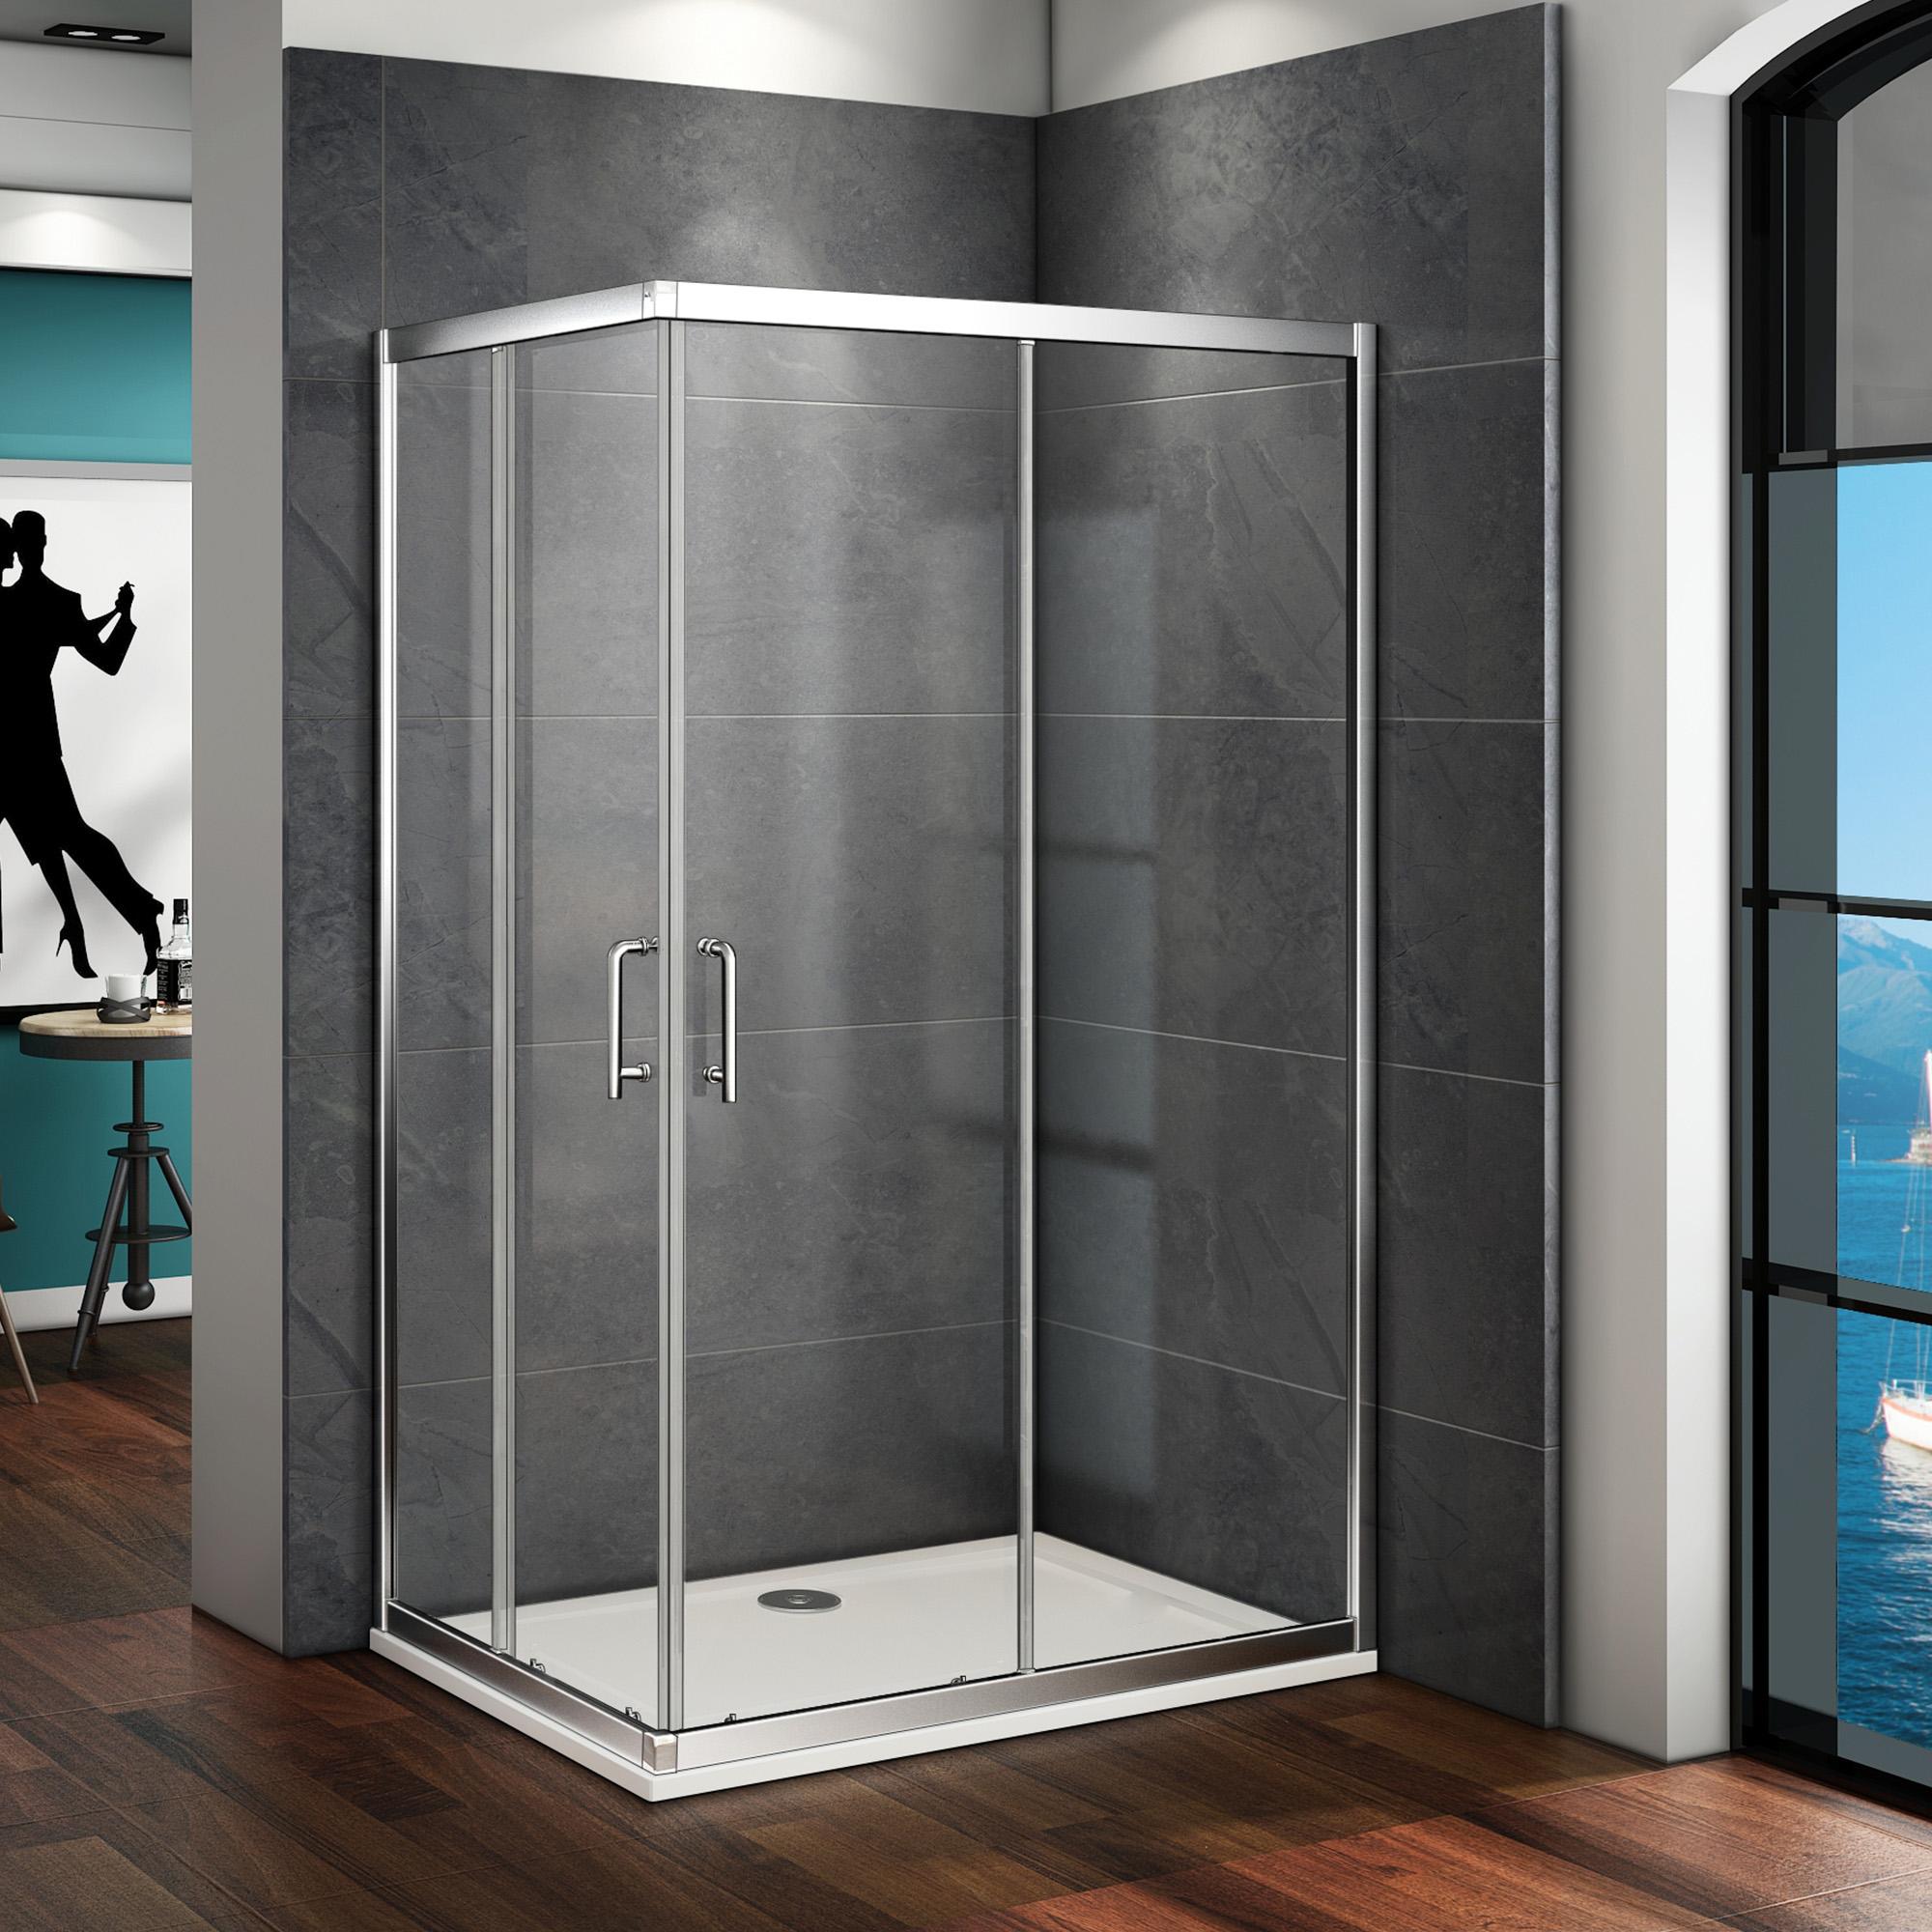 2000 #237BA8  Corner Entry Shower Enclosure Sliding Cubicle Glass Double Door EBay image Ebay Entry Doors 41532000